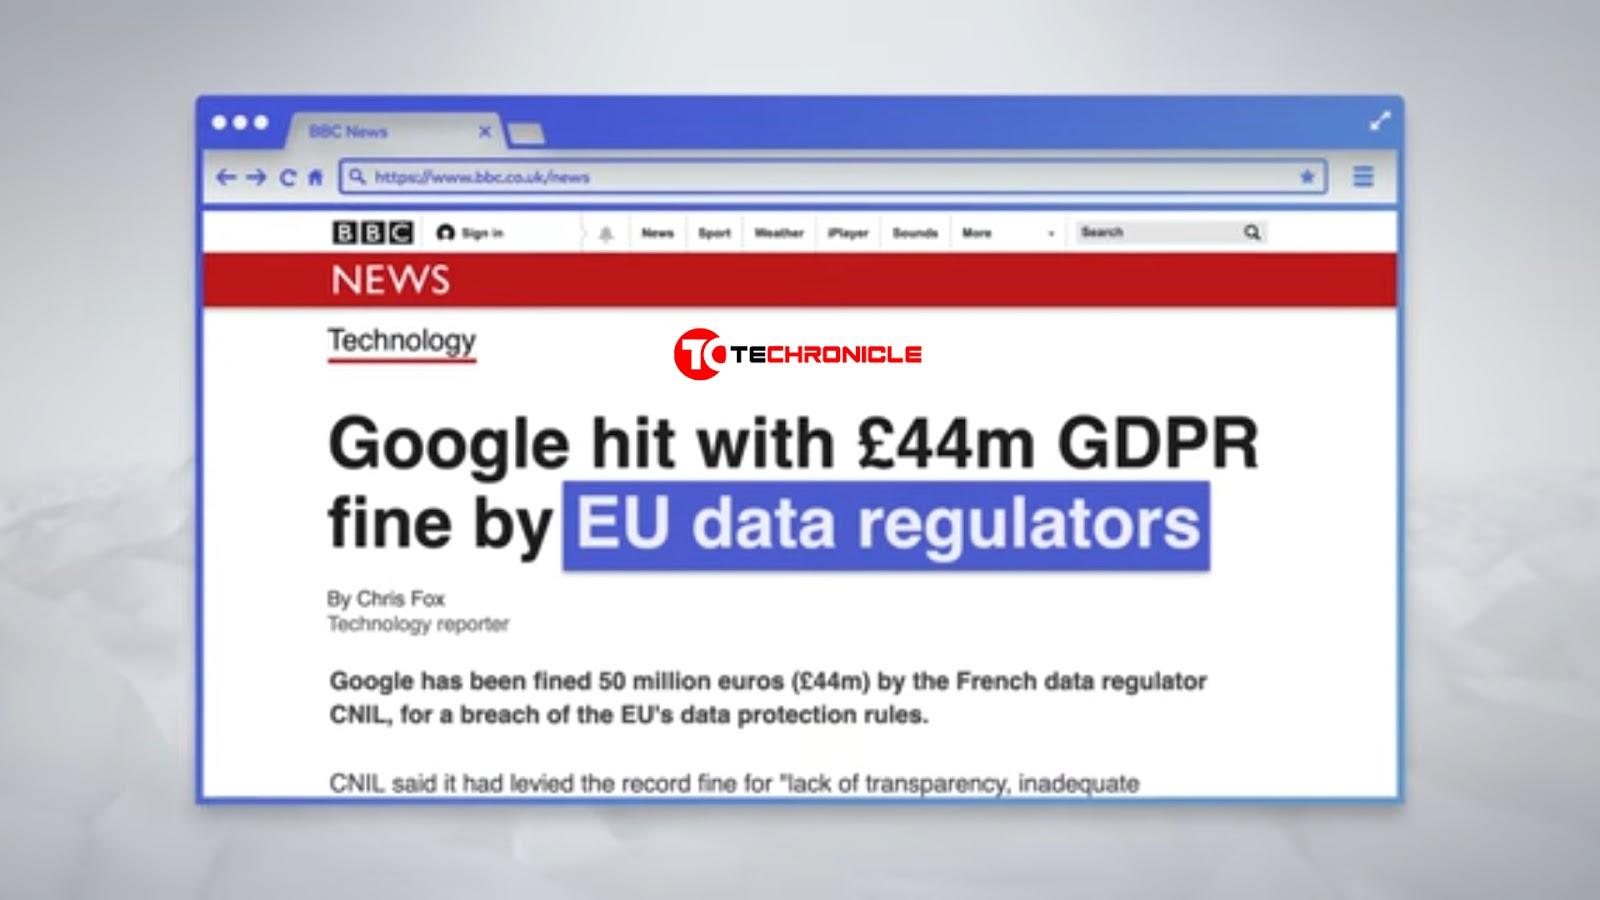 Google Data Regulations Screen Techronicle